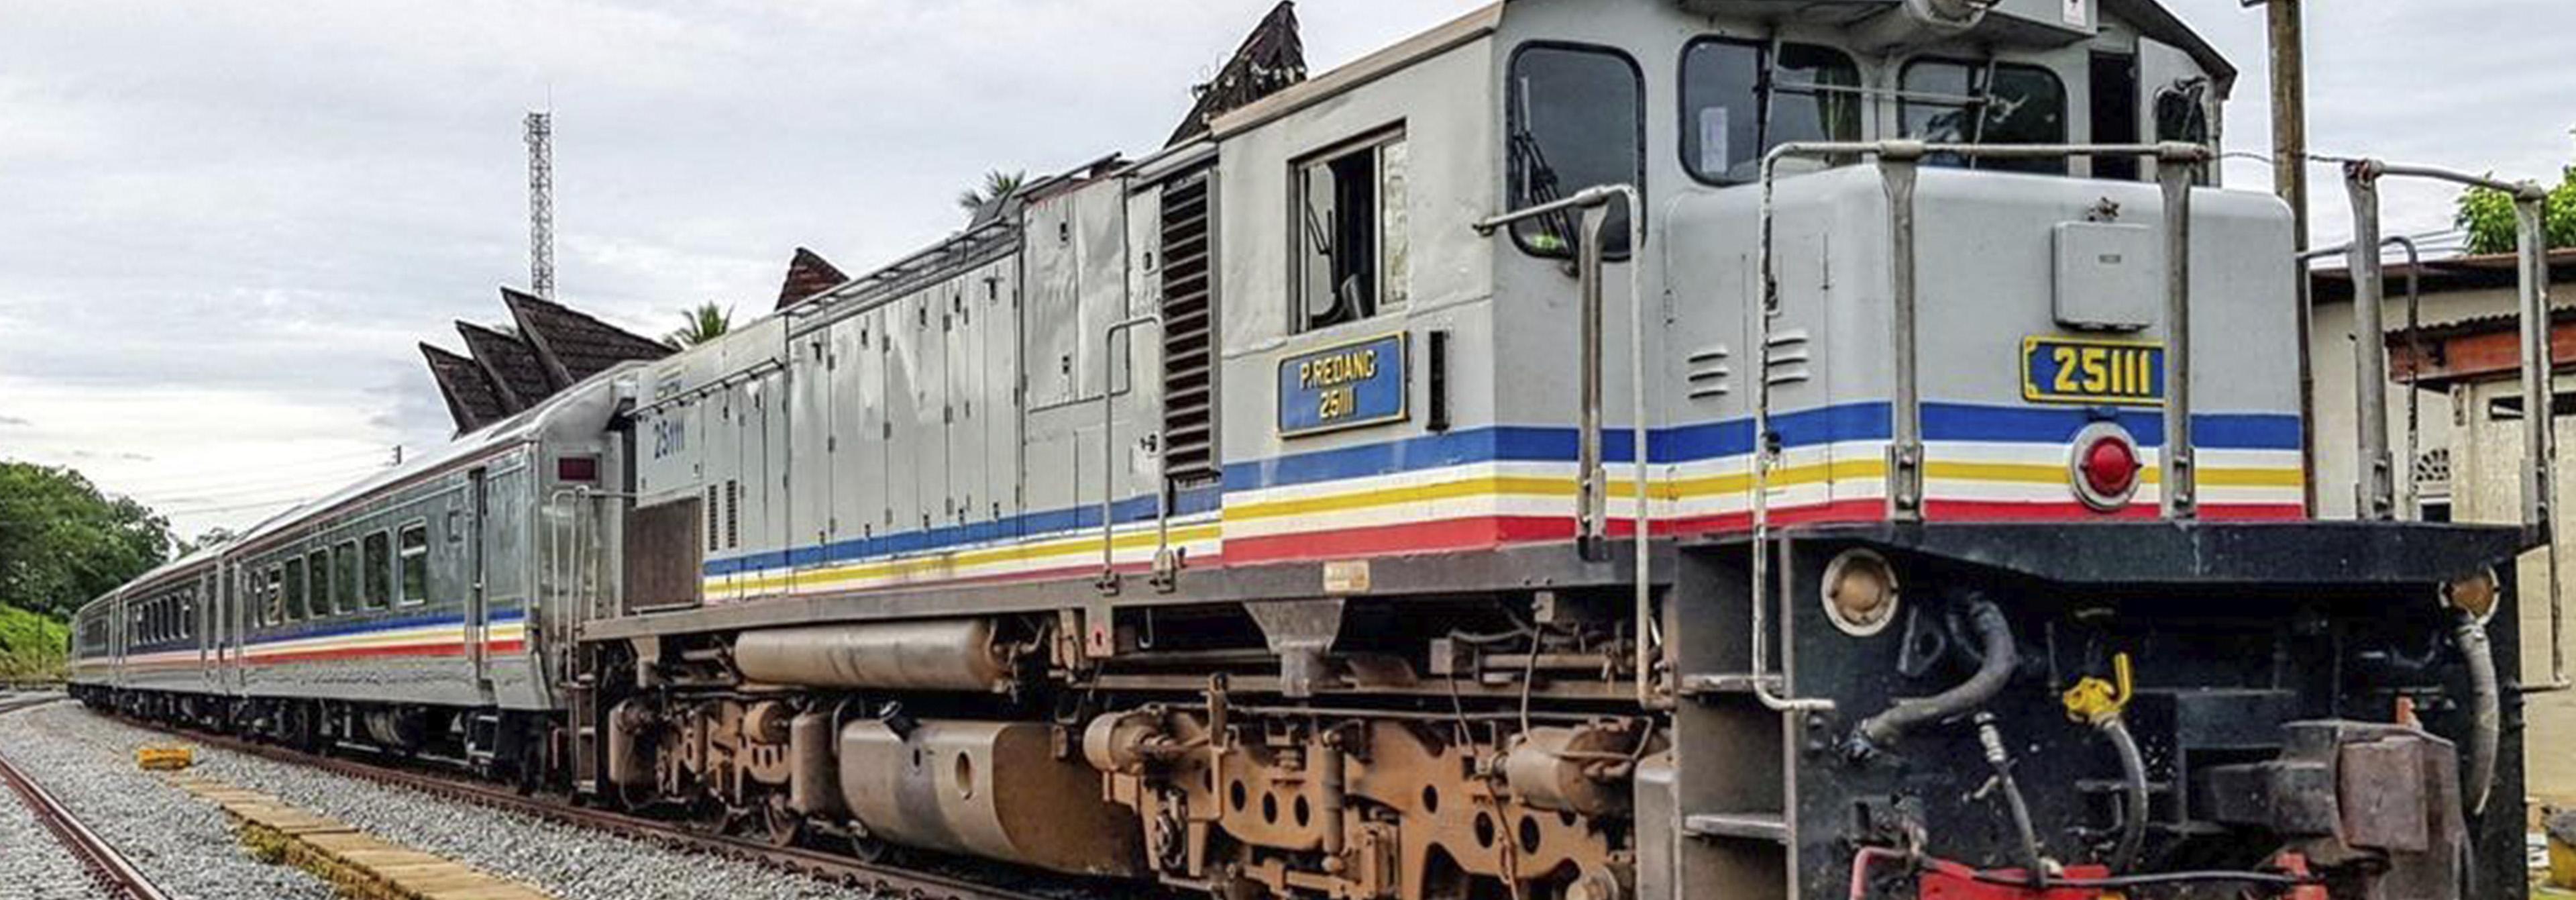 Tren Malasia